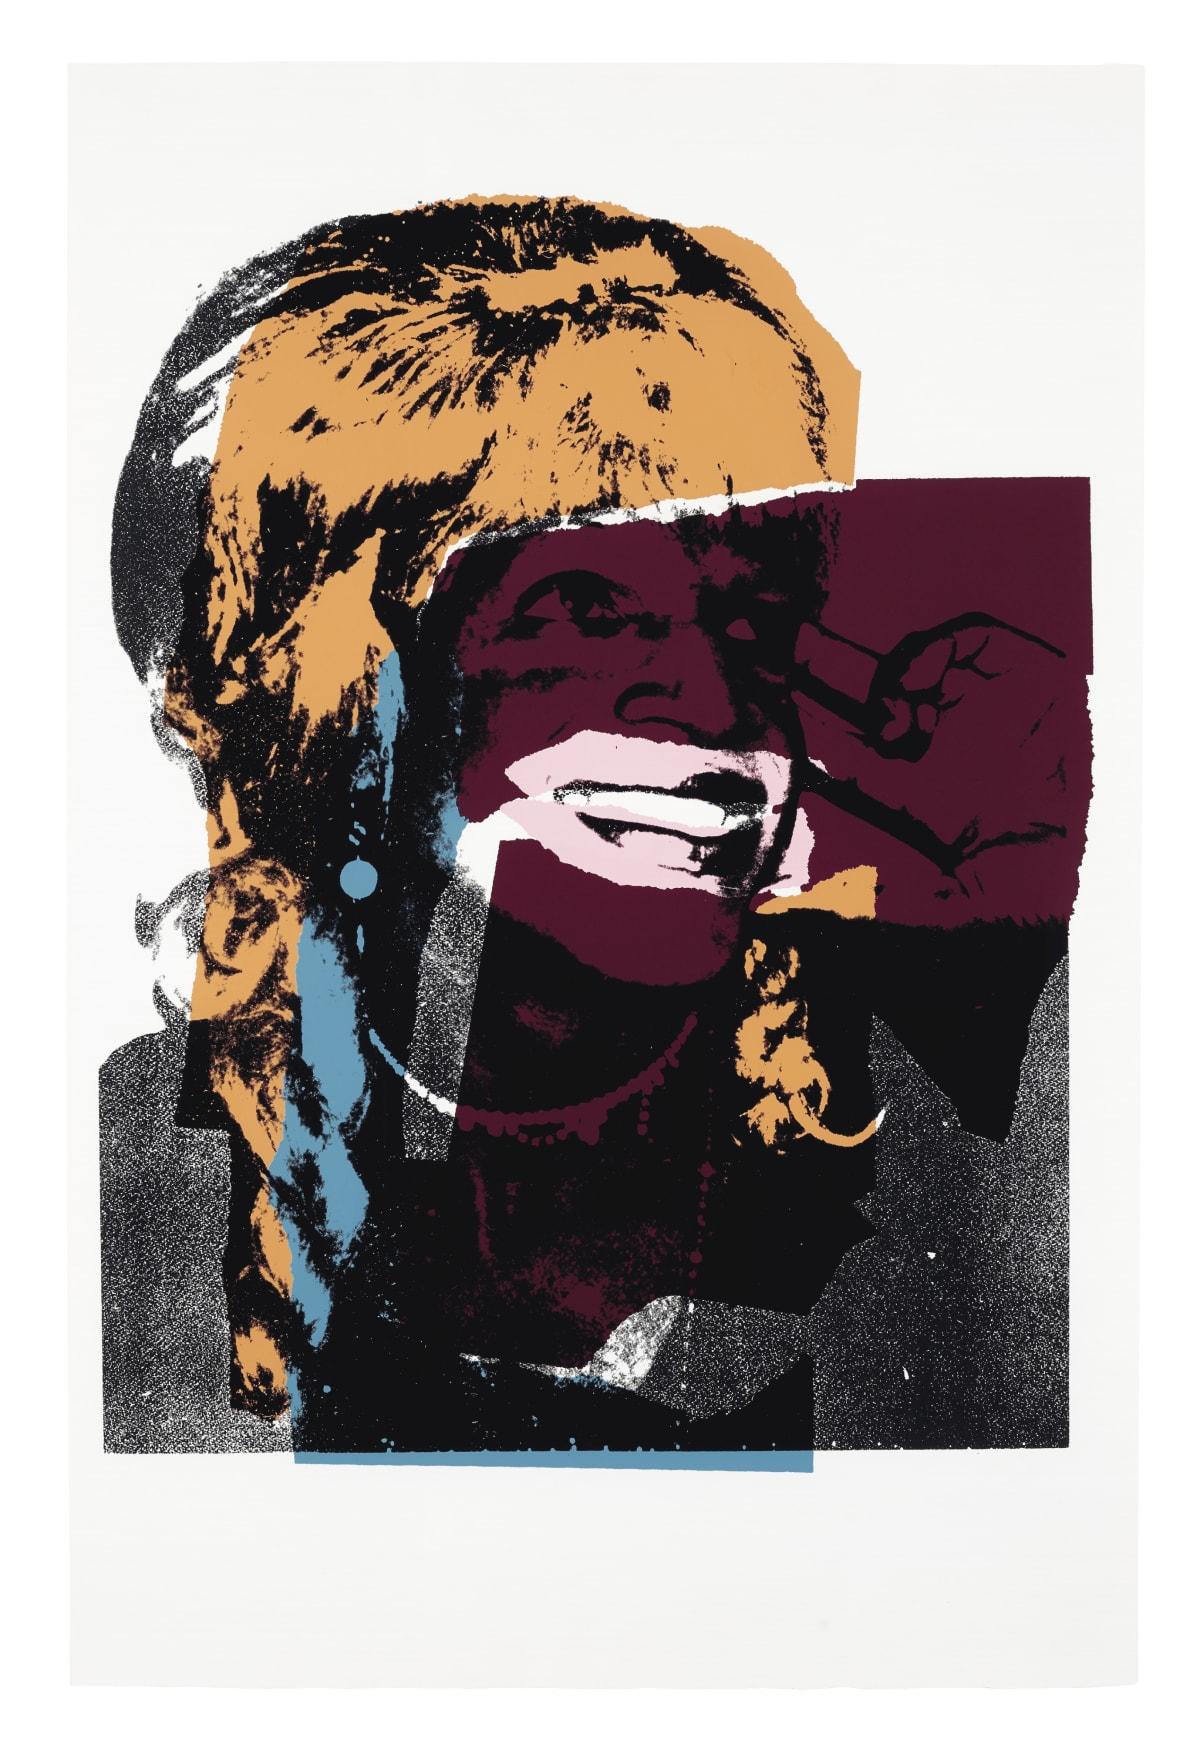 Ladies and Gentlemen II.133, 1975, by Andy Warhol, Portfolio of Ten Screenprints, edition 125 at Coskun Fine Art